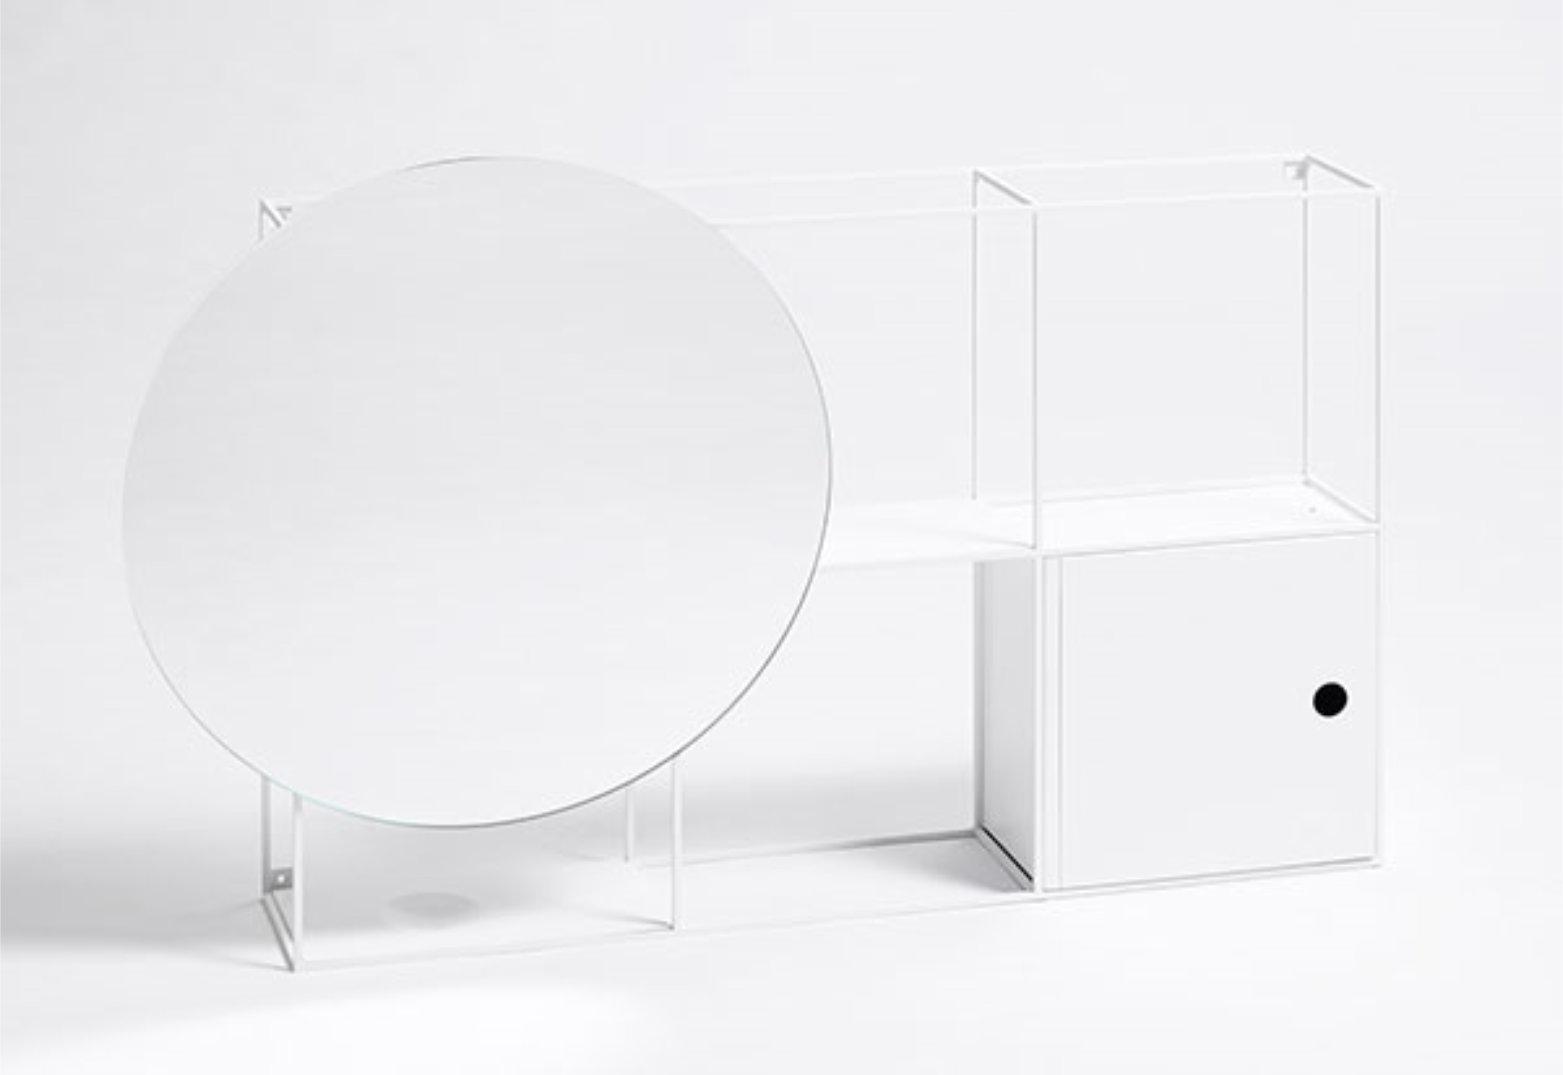 interiorlines_felt_white_norm_architects_4_1.jpg